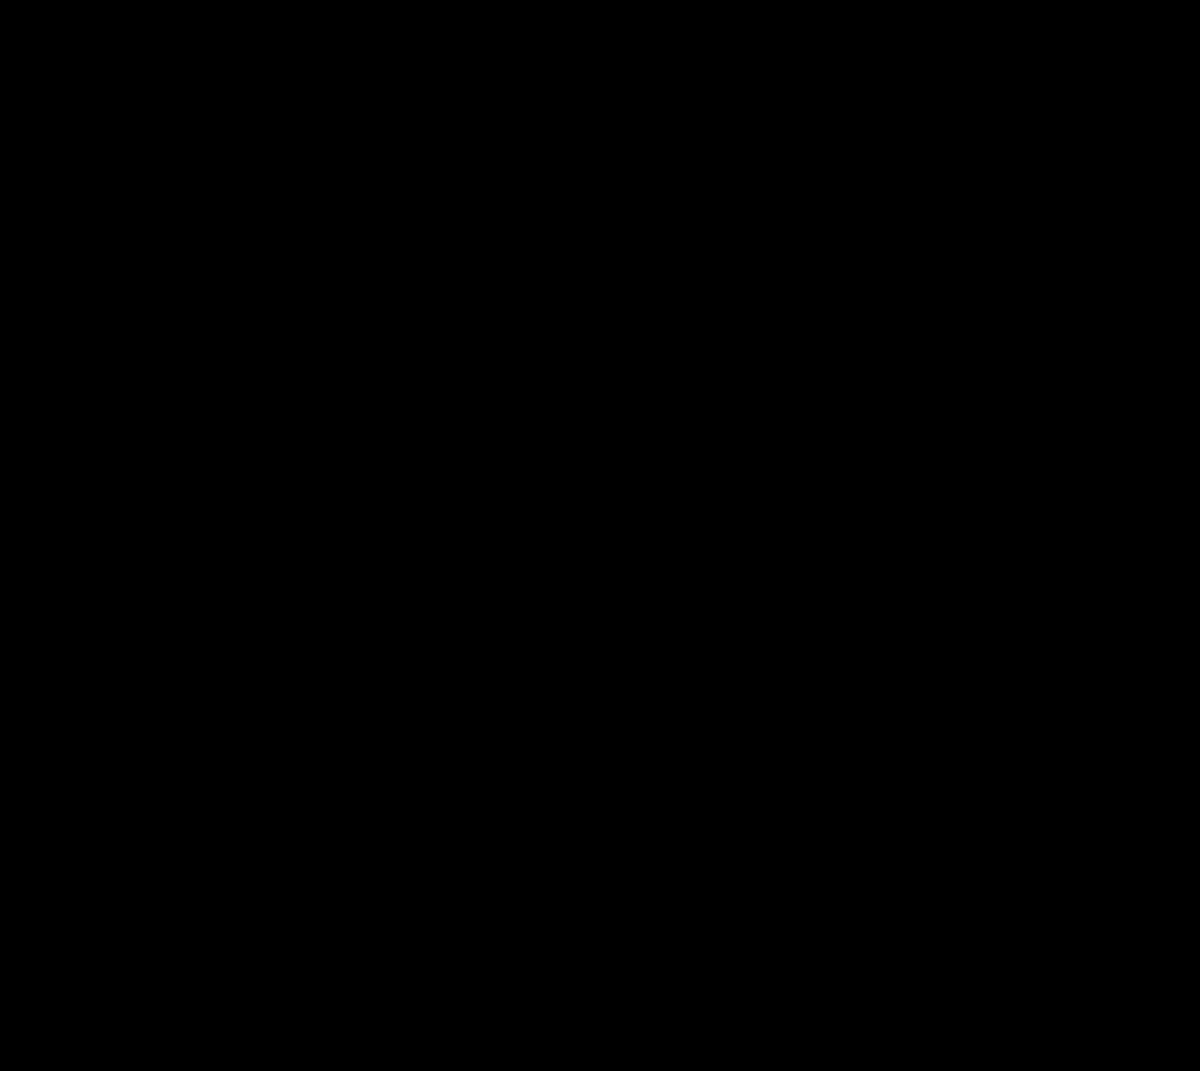 viagra dapoxetine canada